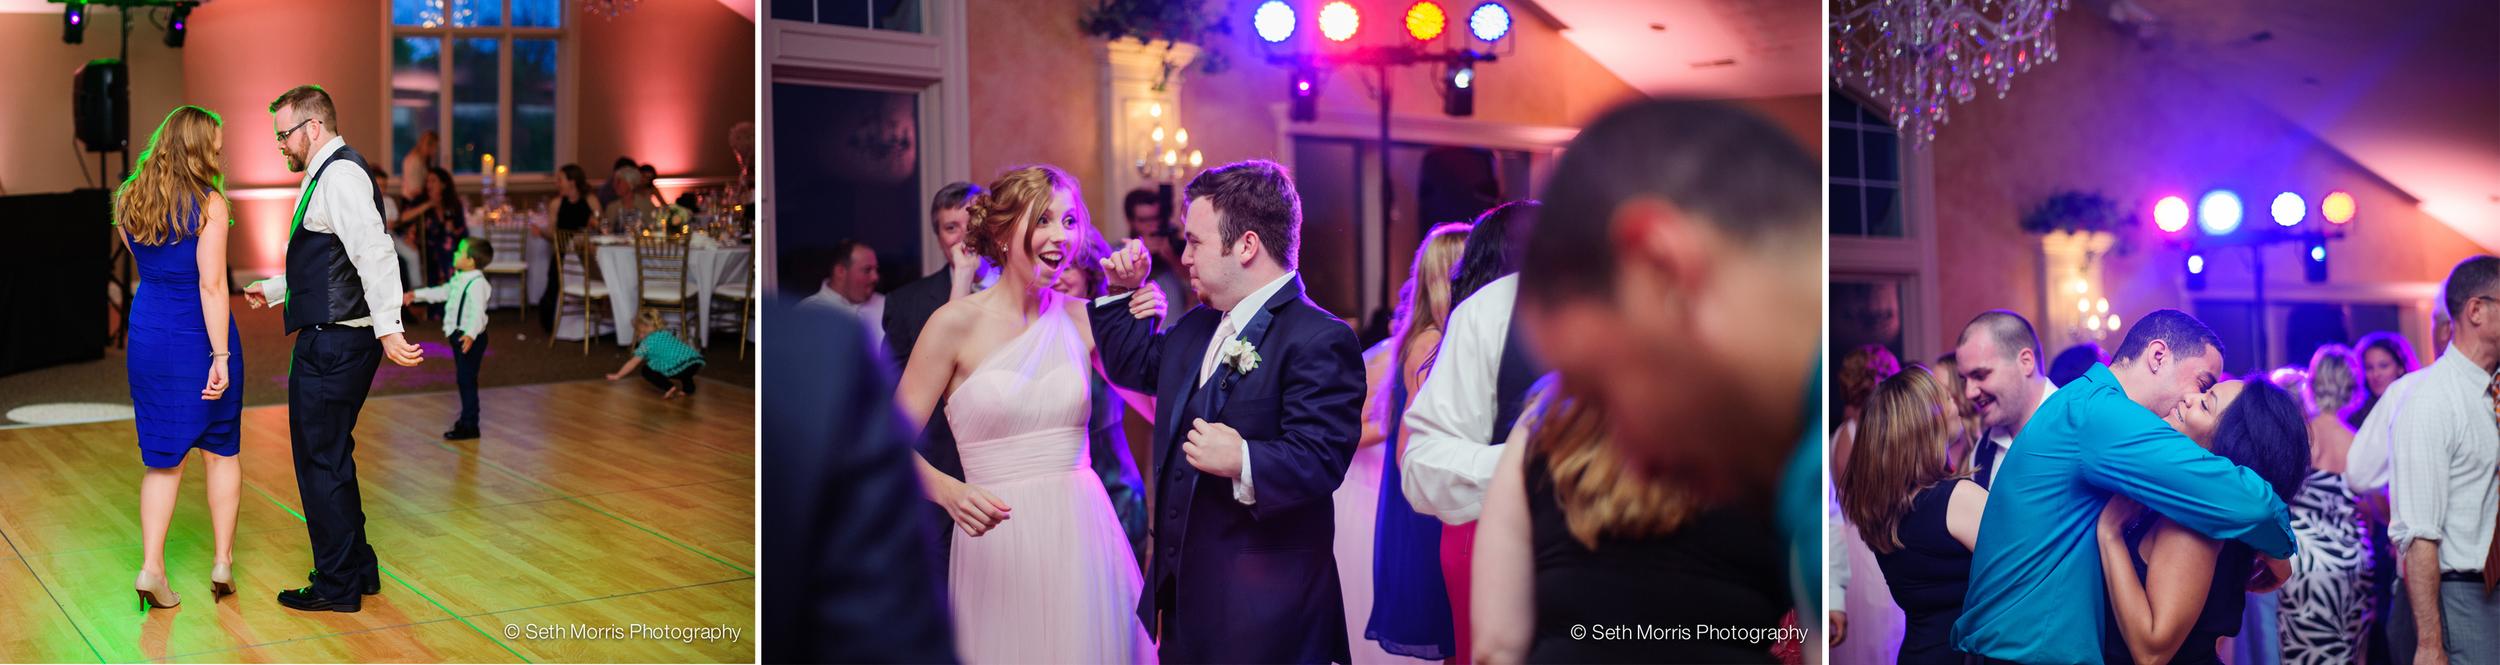 metamora-fields-wedding-photographer-peoria-194.jpg